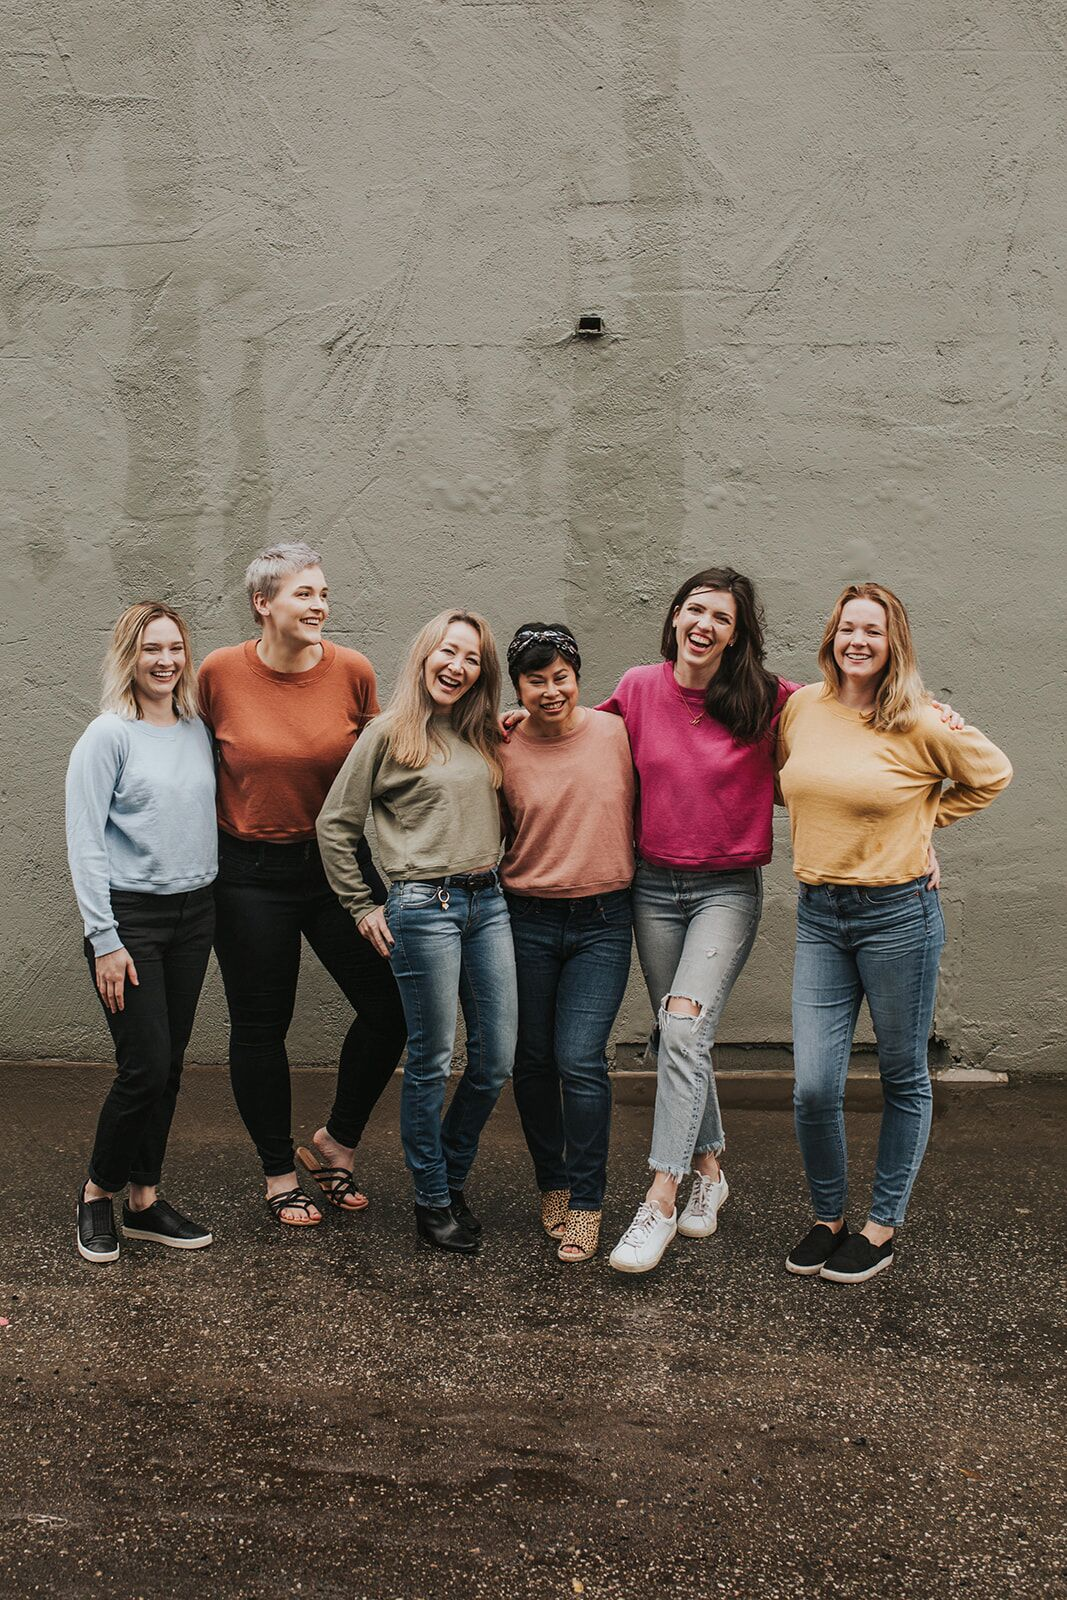 4 ways to style a sweatshirt